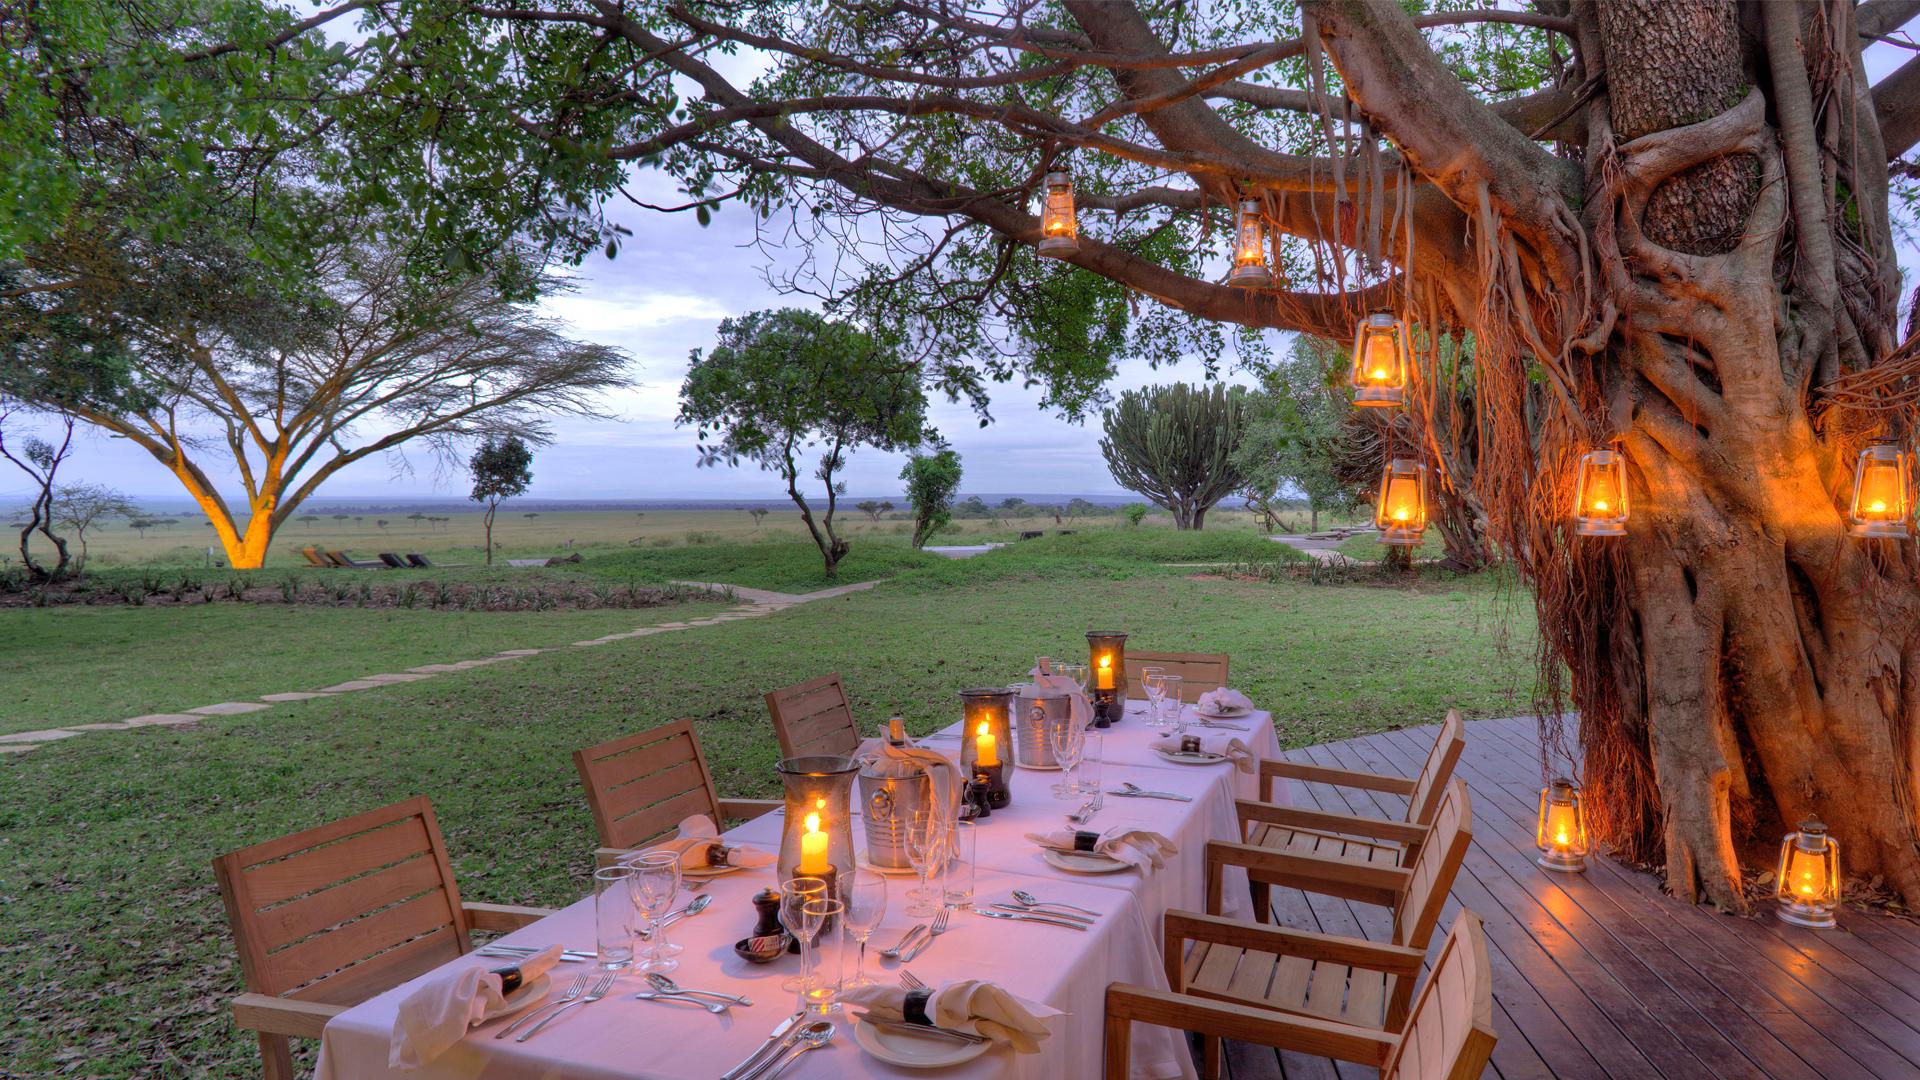 31c5018eb Safarilink-2 nights Kichwa Tembo Tented Camp Flying Package